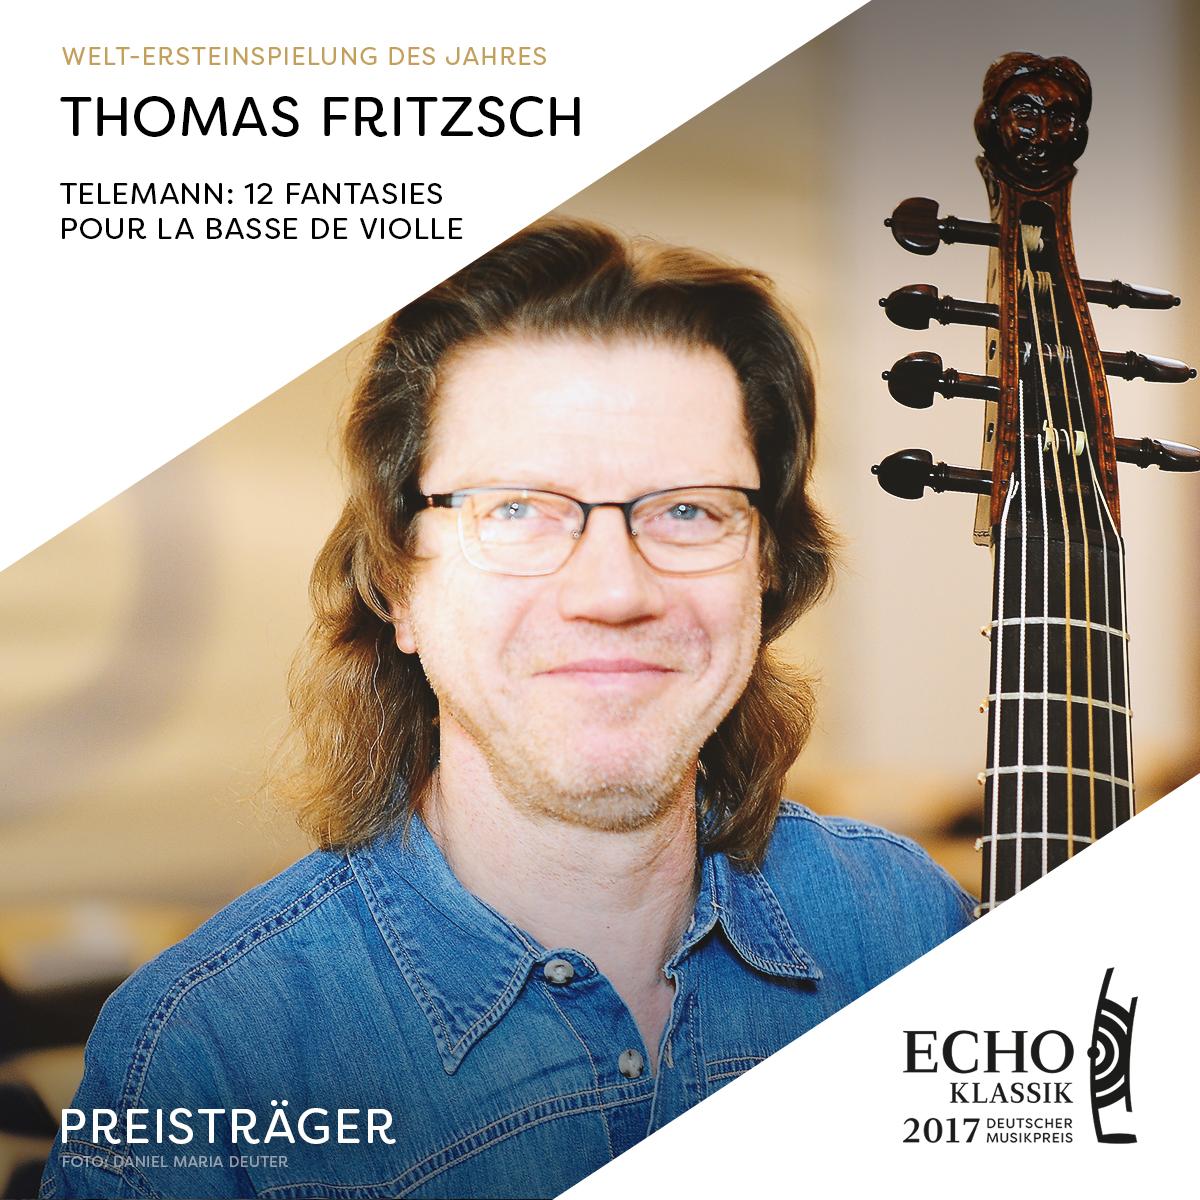 Thomas Fritzsch © Maria Deuter